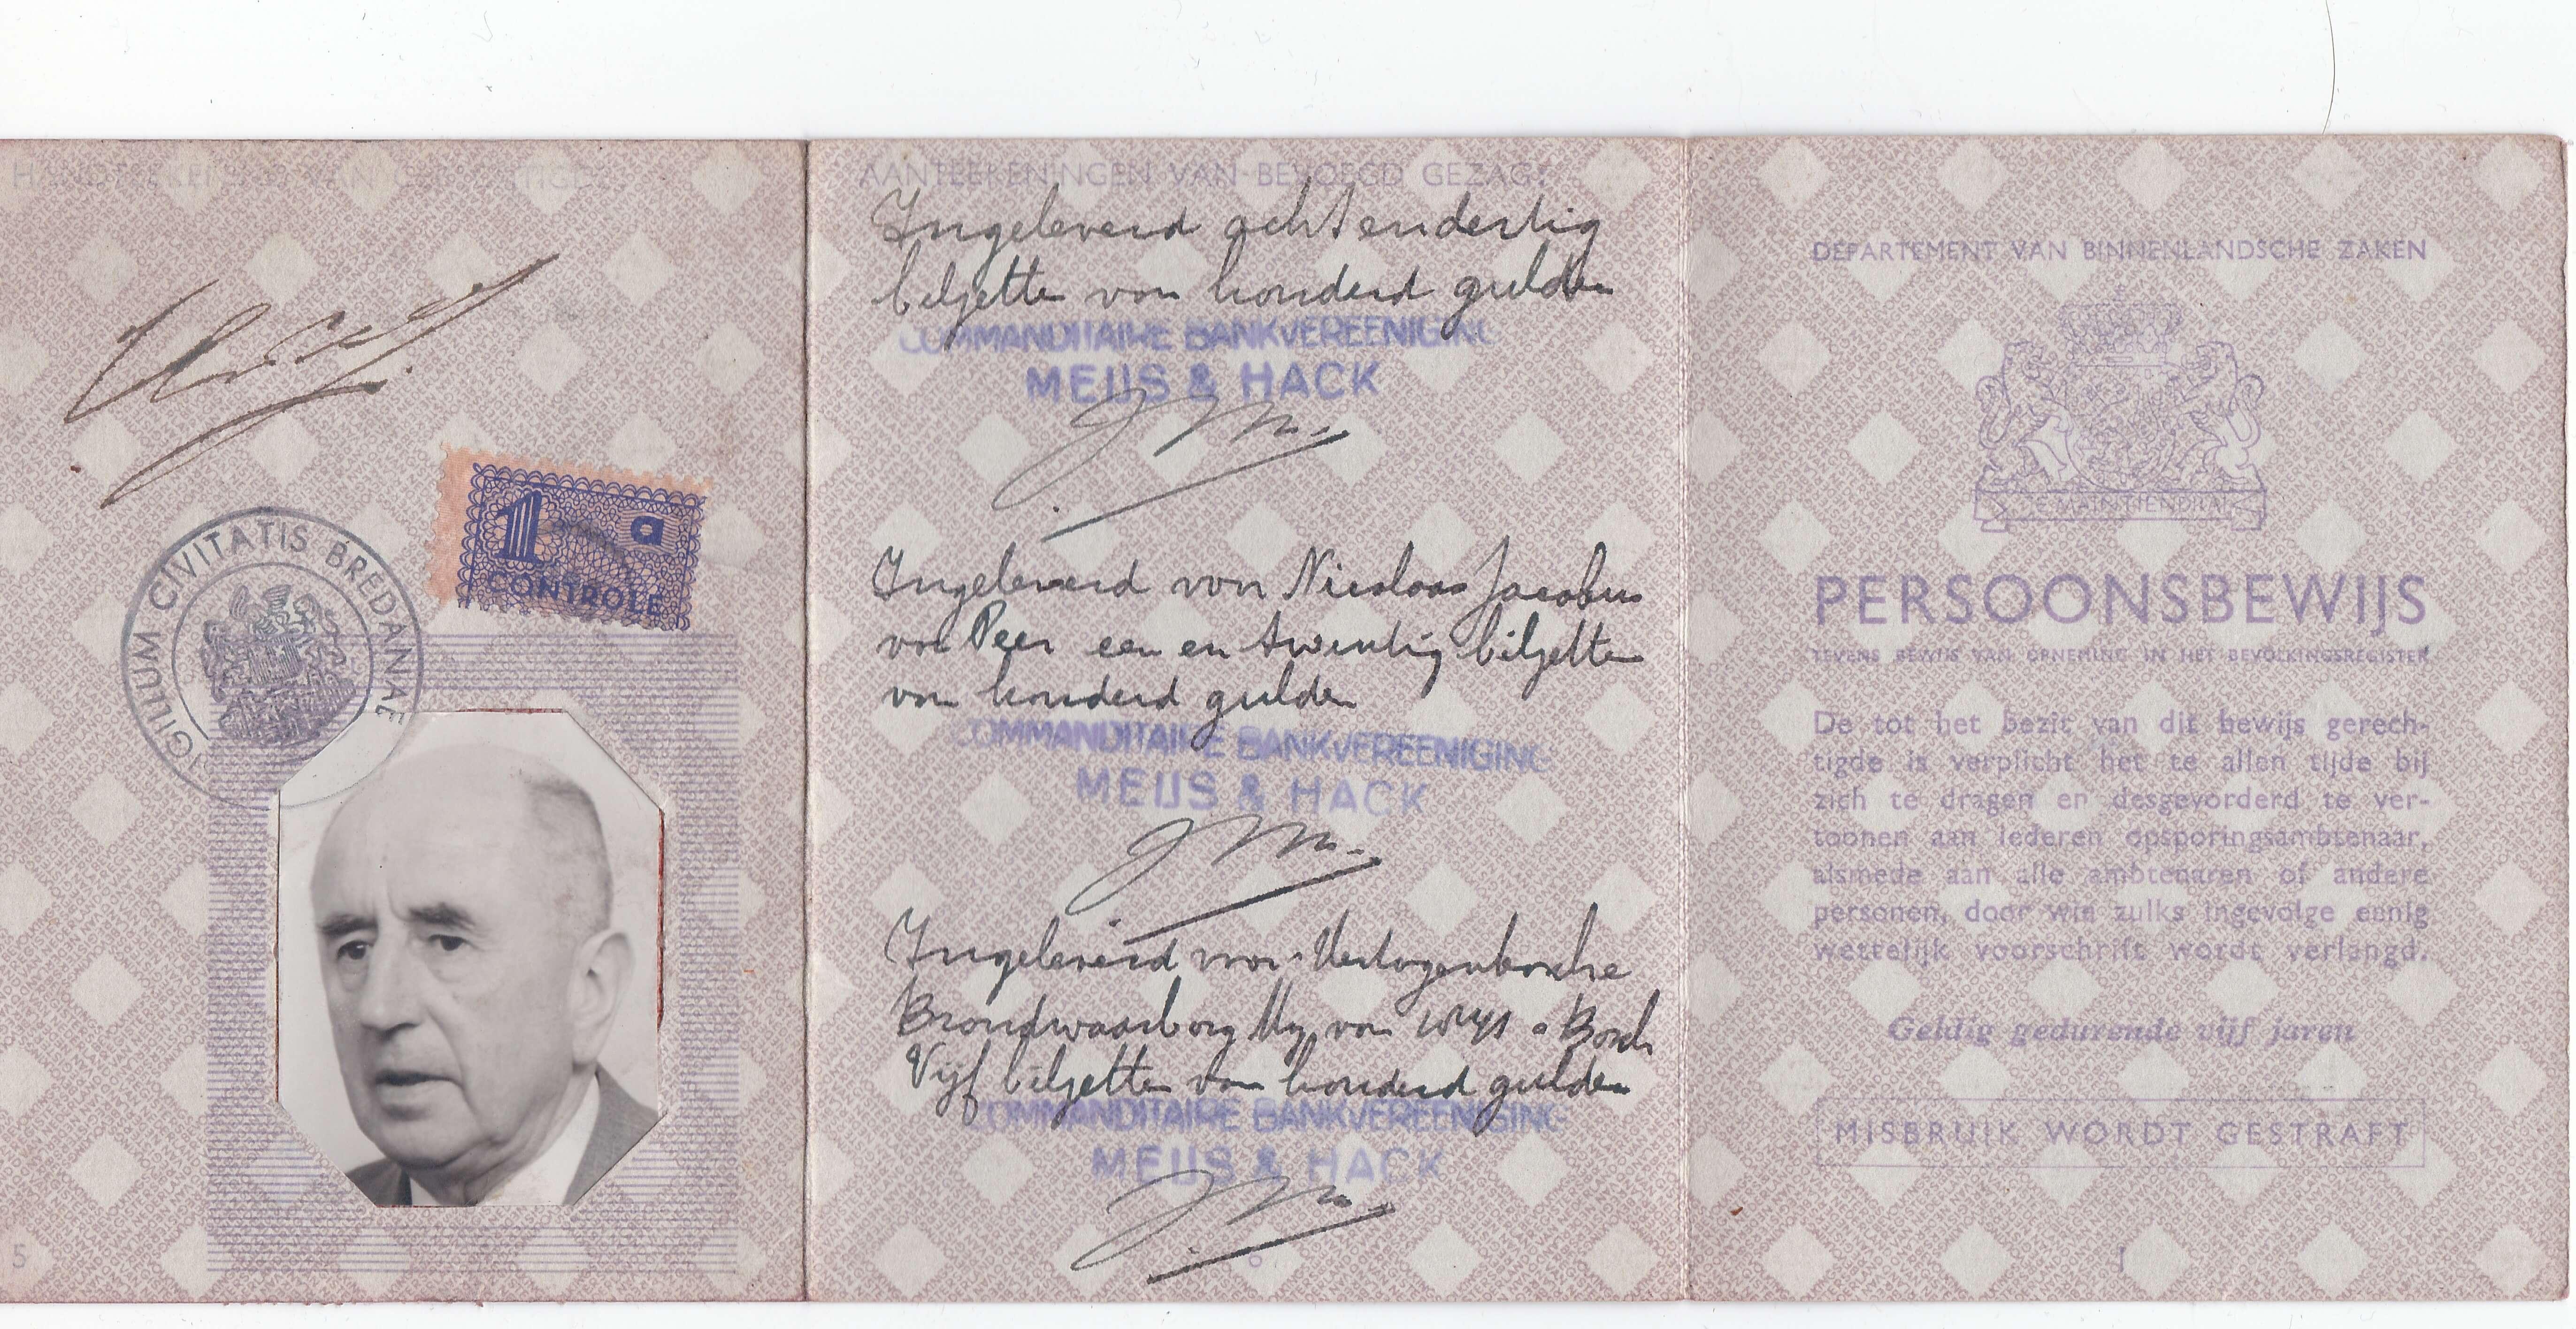 Persoonsbewijs uit wo2 van Henri Bartholomeus van Peer